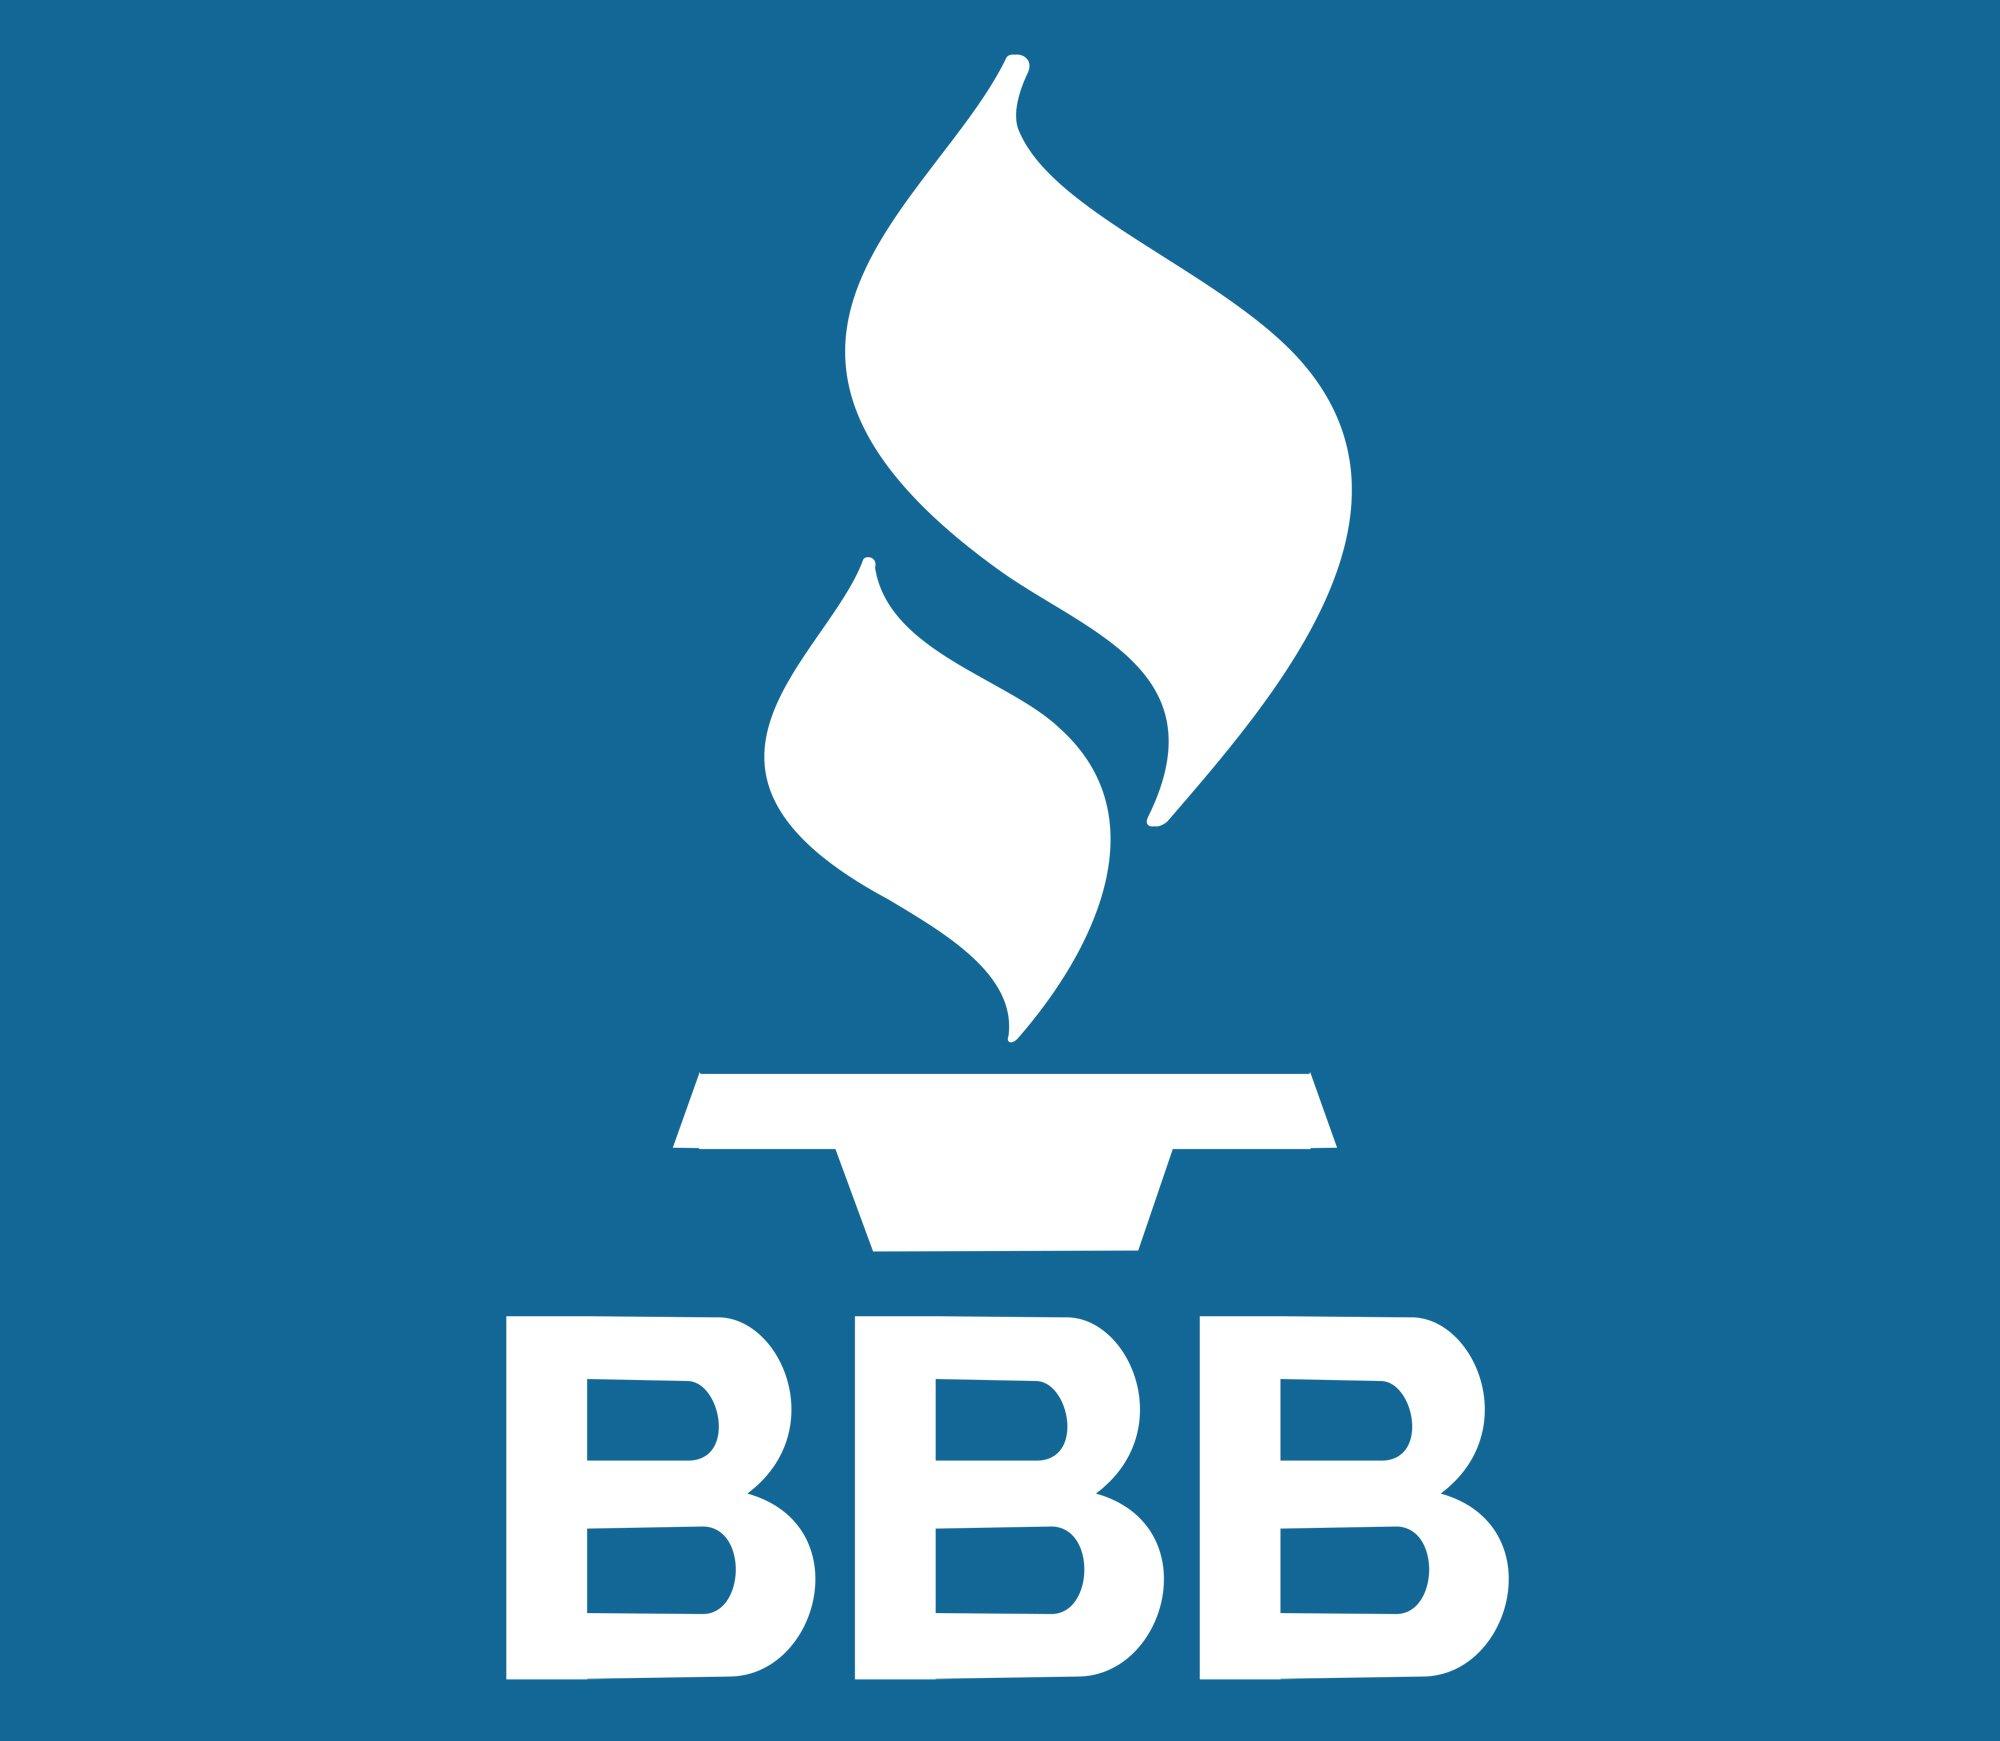 BBB Food Reviews